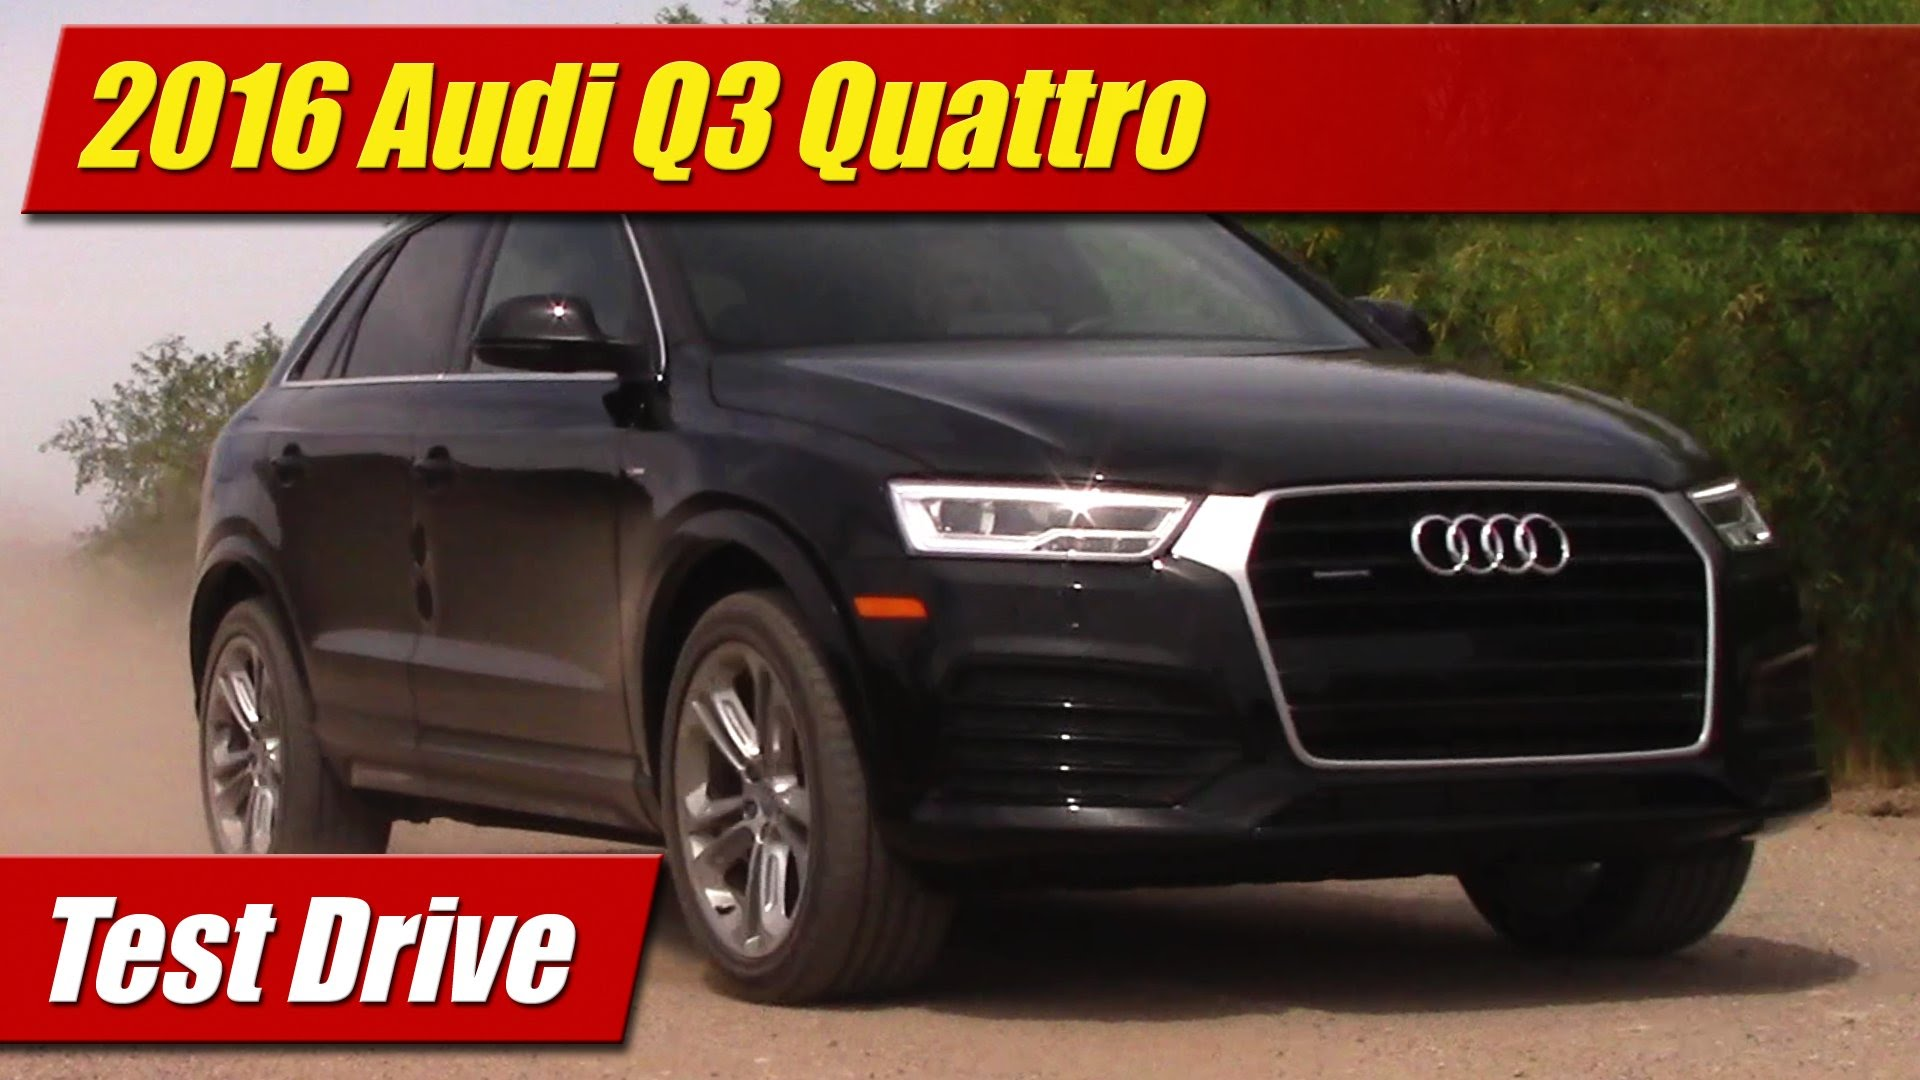 Test Drive: 2016 Audi Q3 Quattro